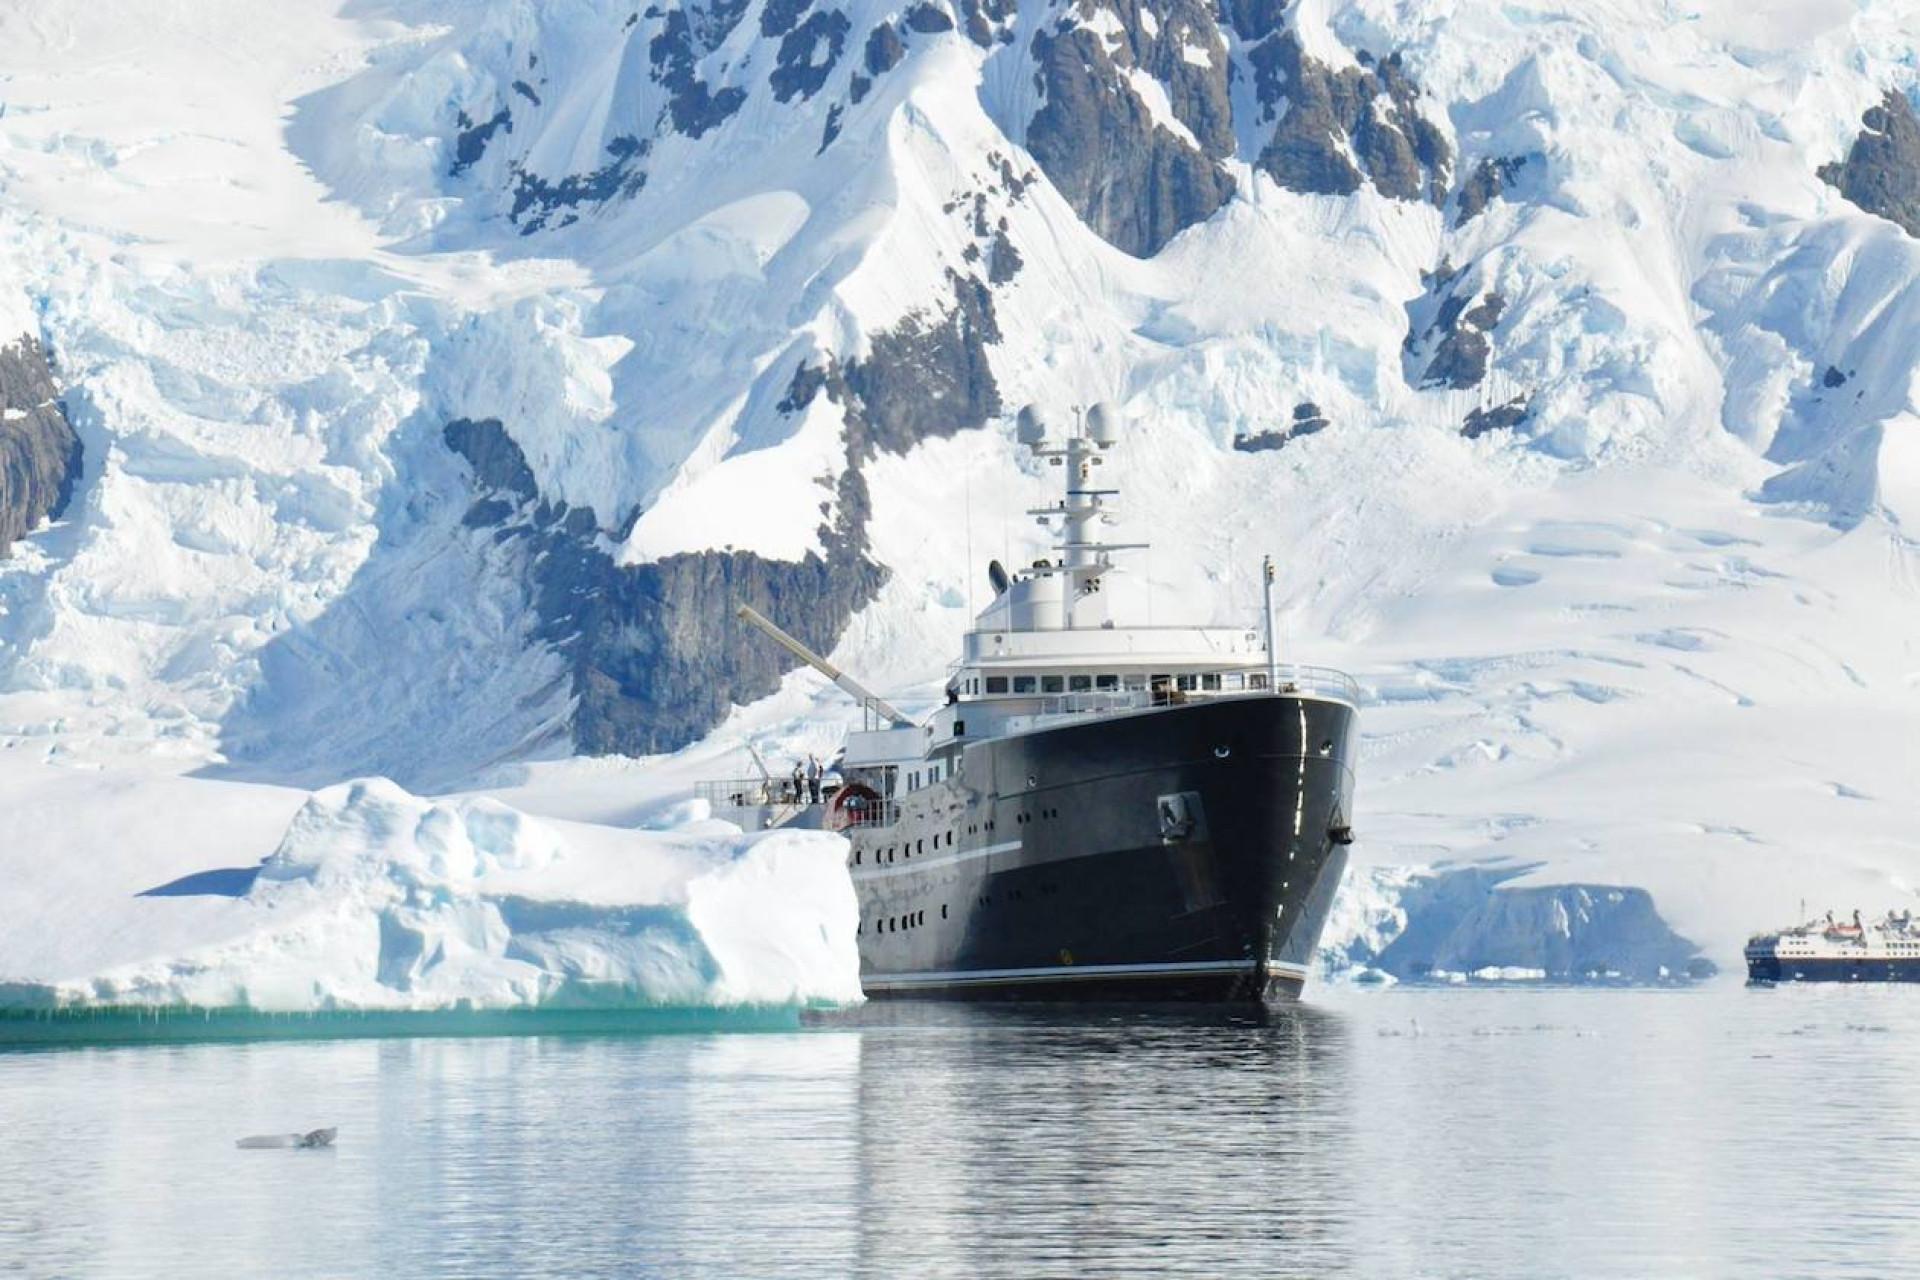 Charter Destination: Antarctica